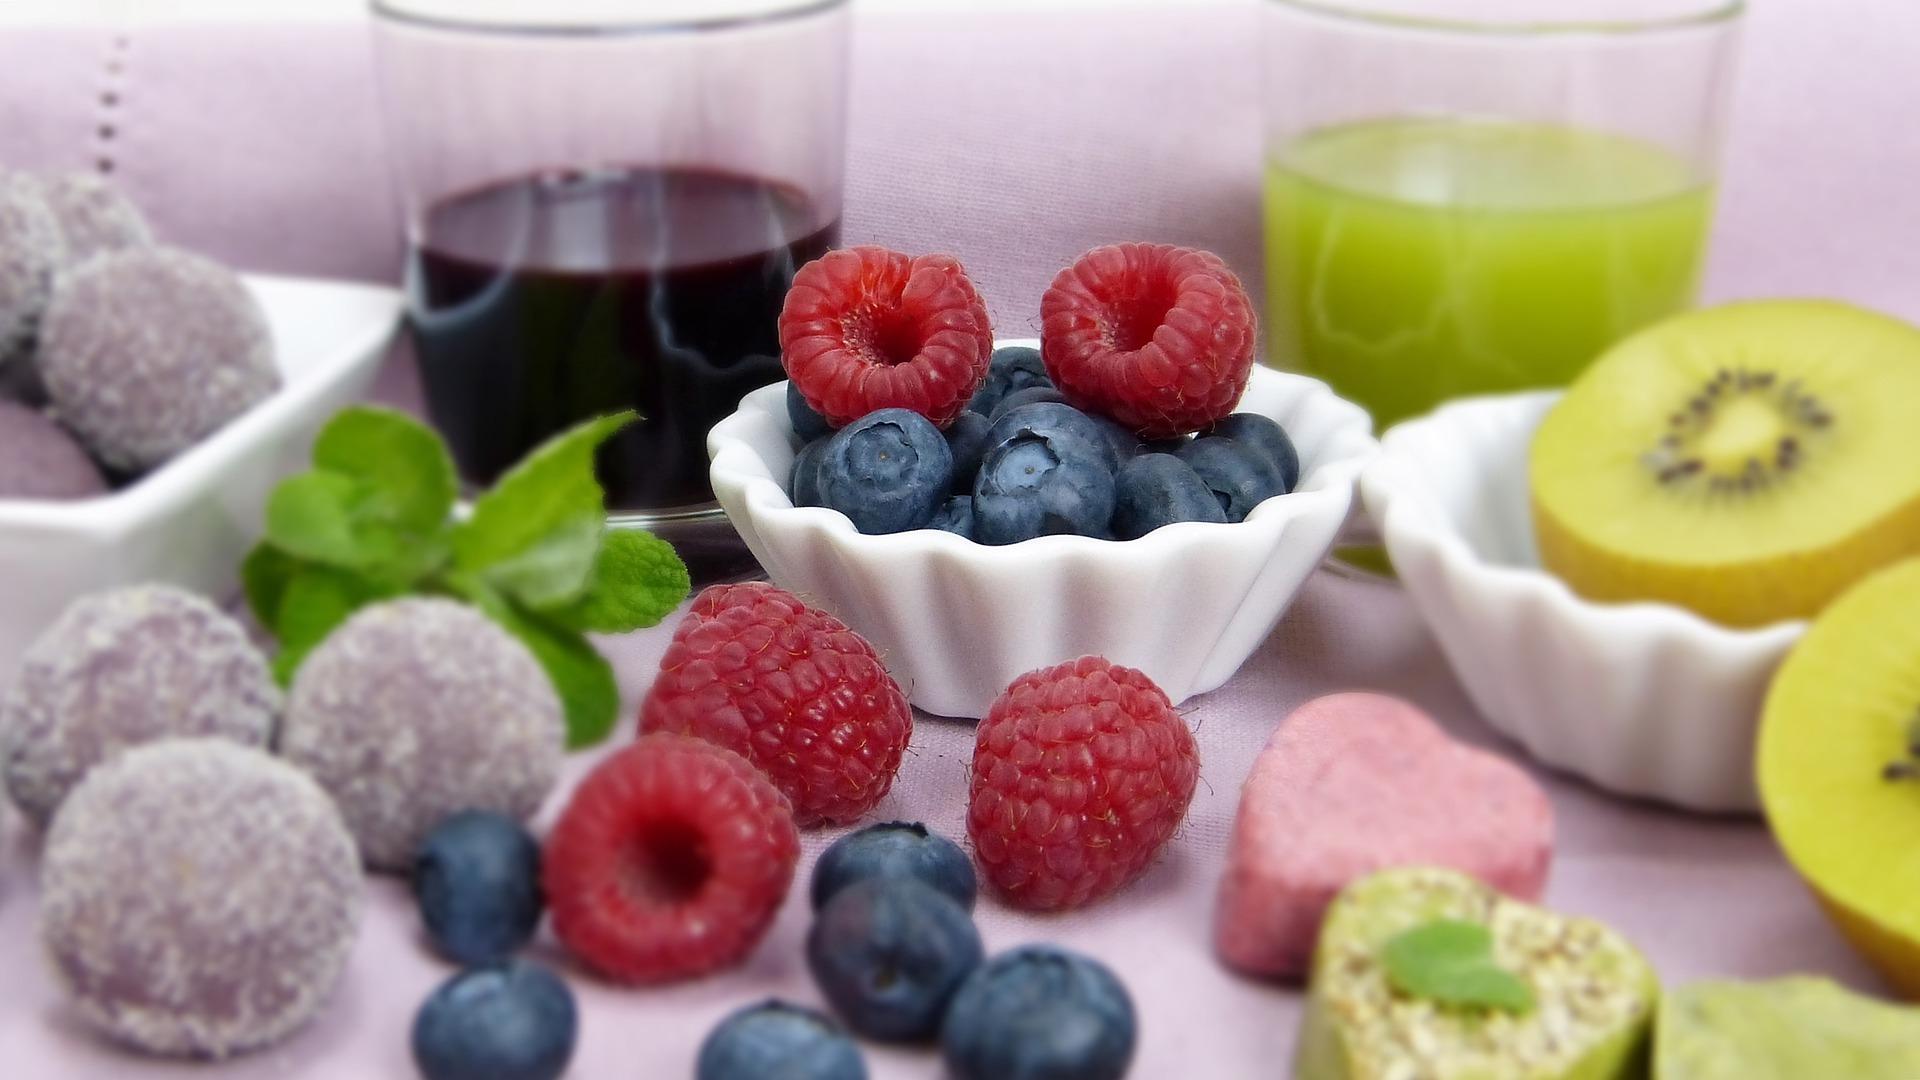 https://pixabay.com/cs/photos/ovoce-maliny-dieta-zdrav%C3%A9-dezert-3111745/